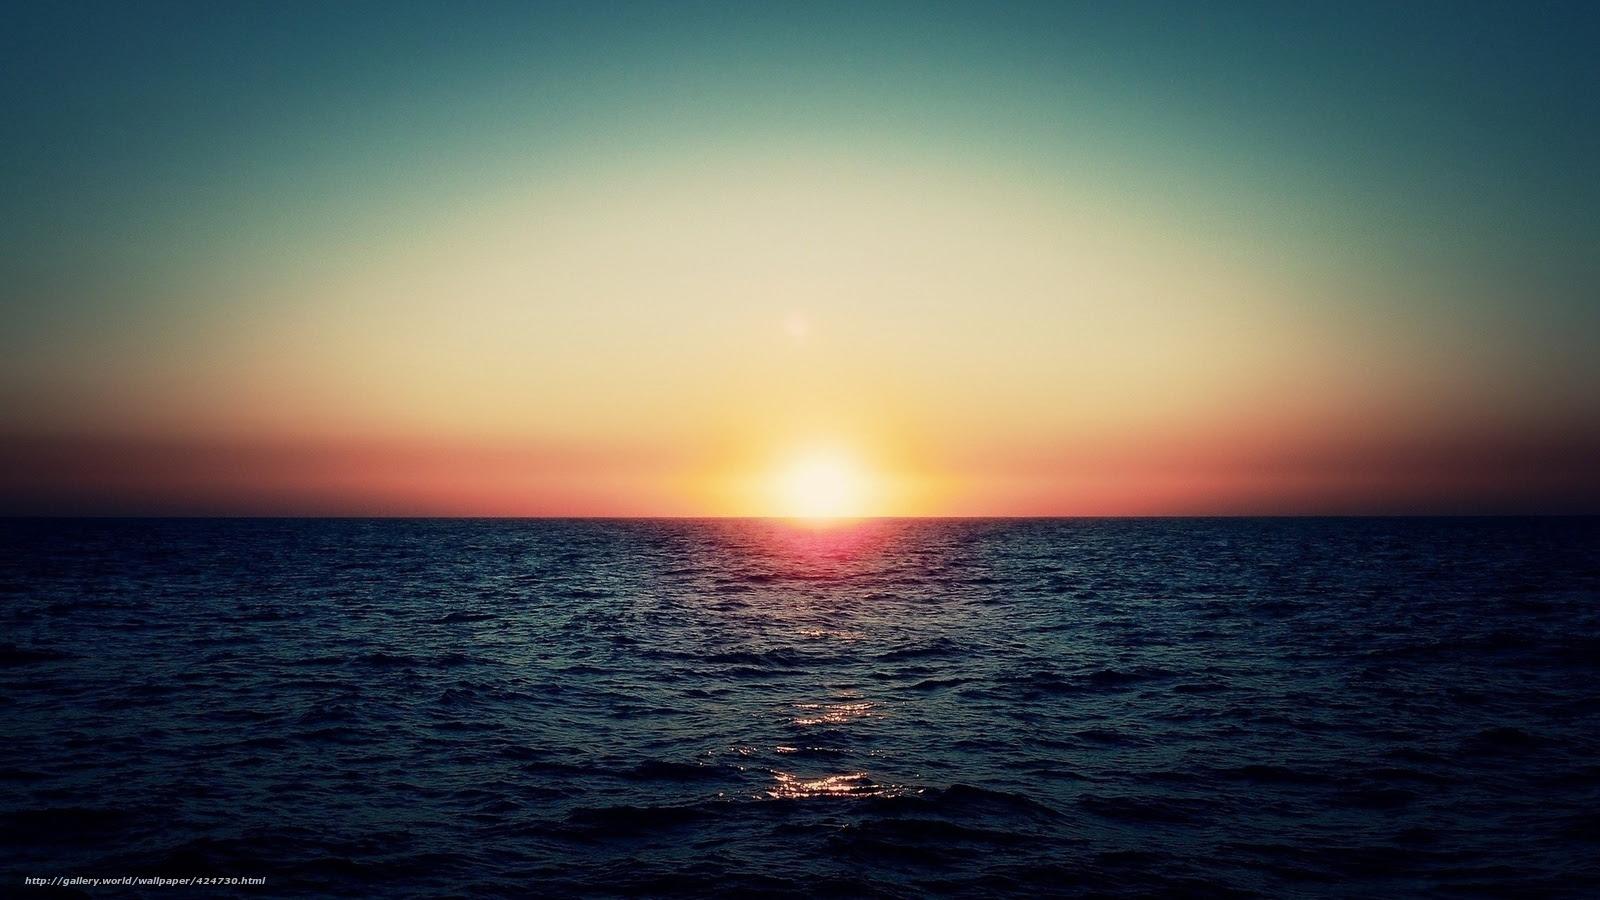 Download Wallpaper Sea Sun Sky Free Desktop Wallpaper In The